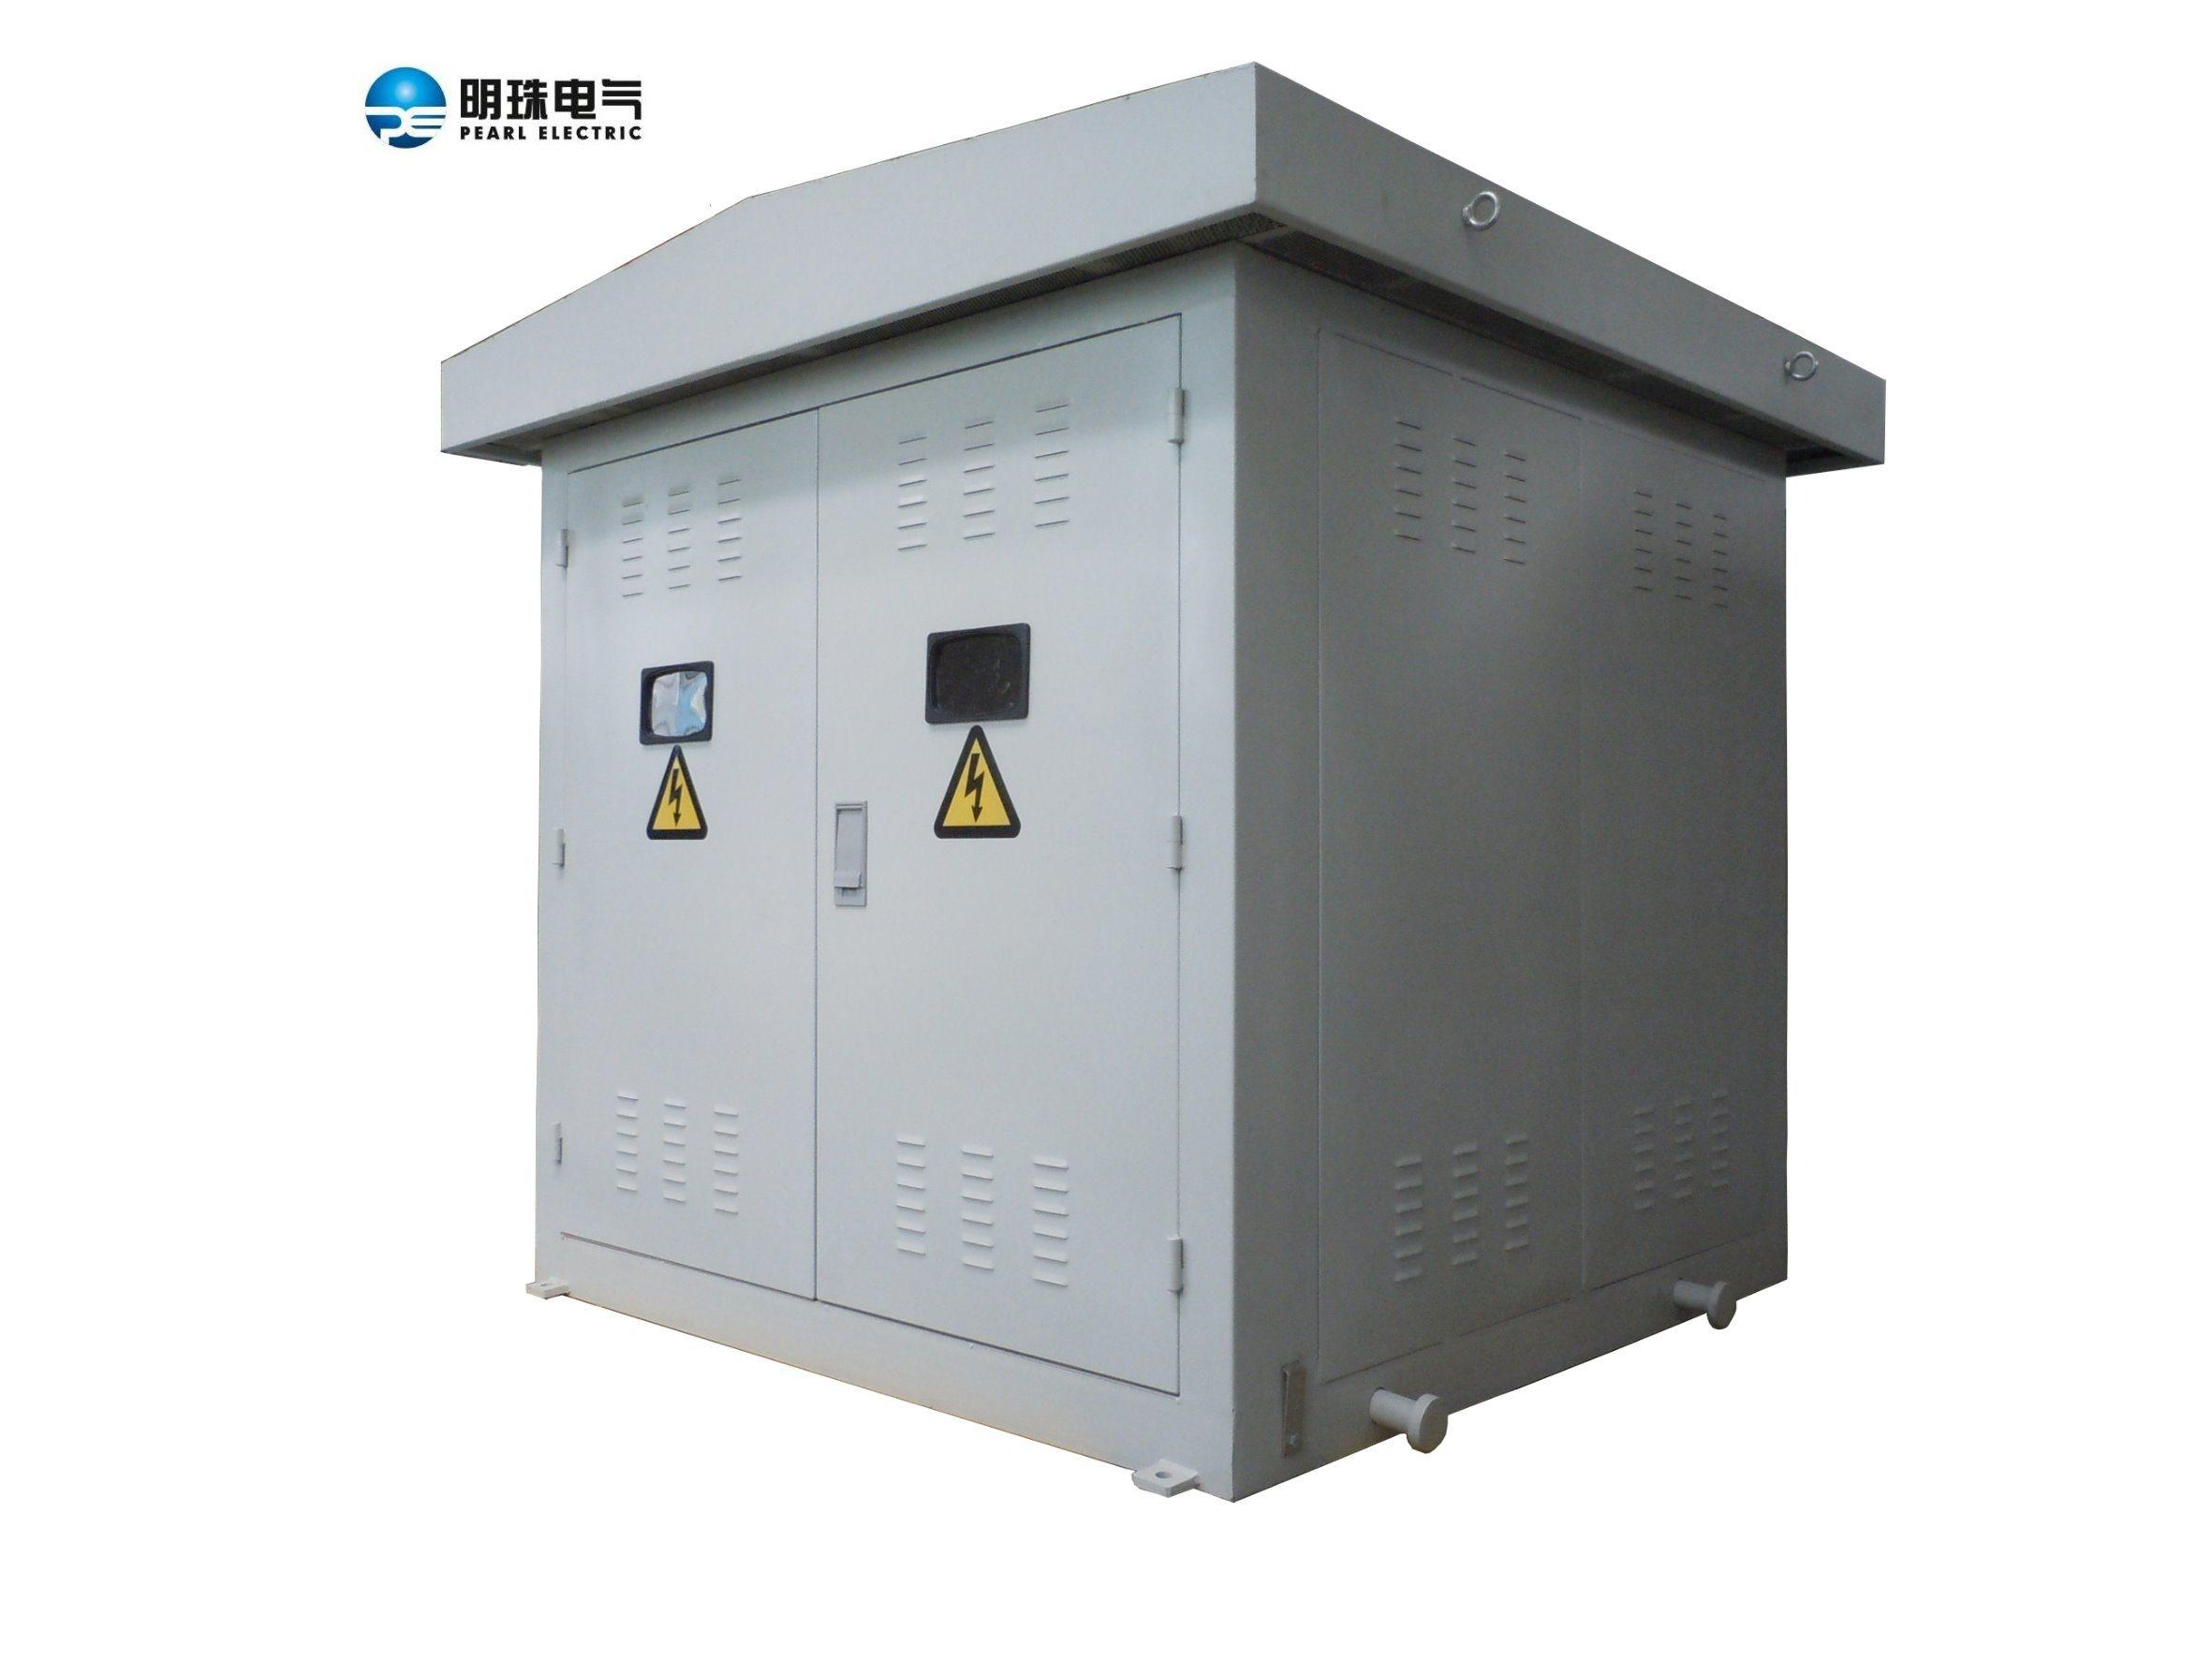 6.6kv Class Oil-Immersed Distribution Transformer